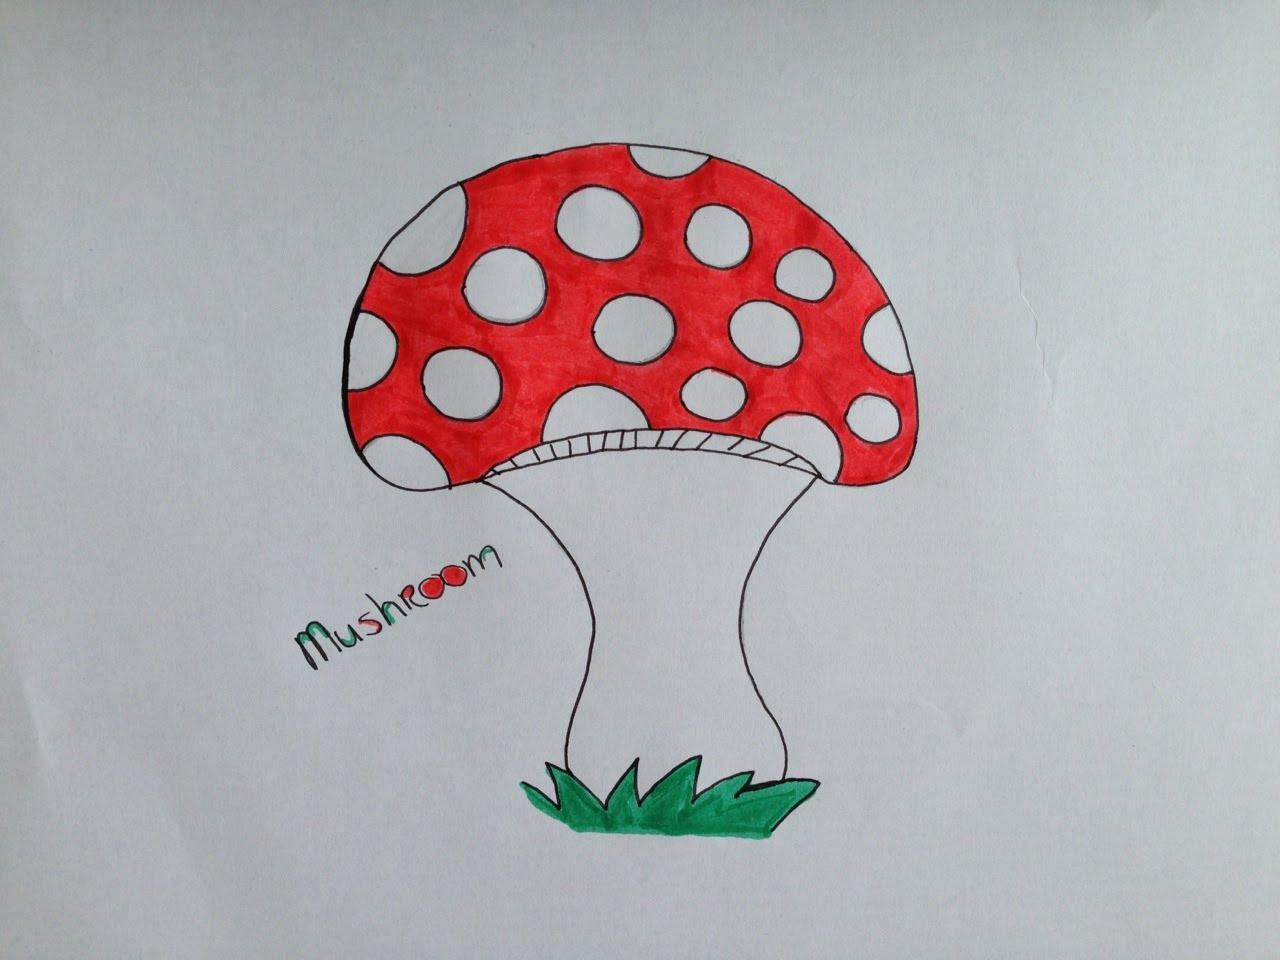 1280x960 How To Draw A Mushroom